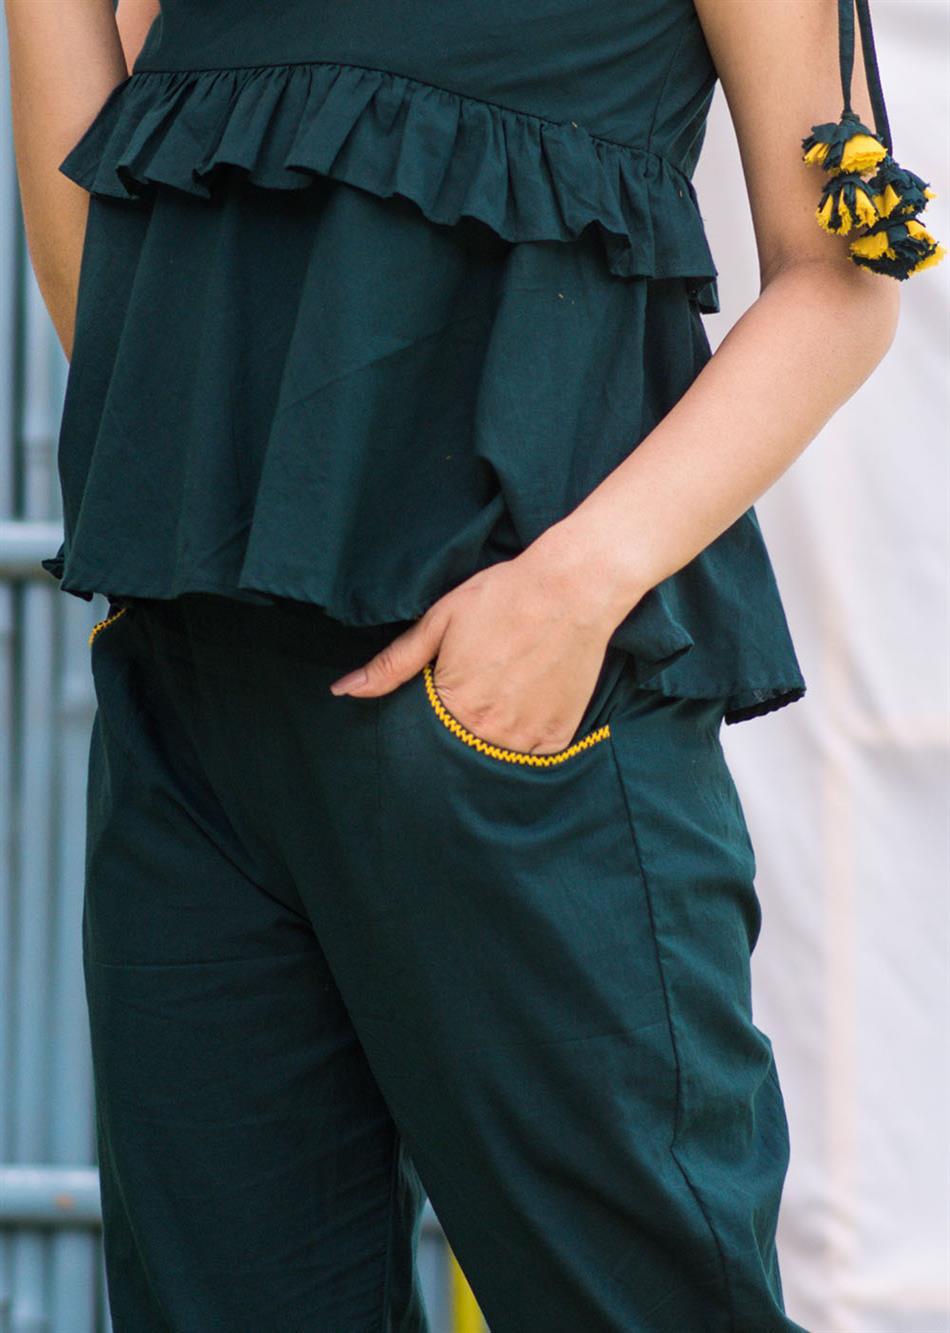 Party love - Pants By Jovi Fashion